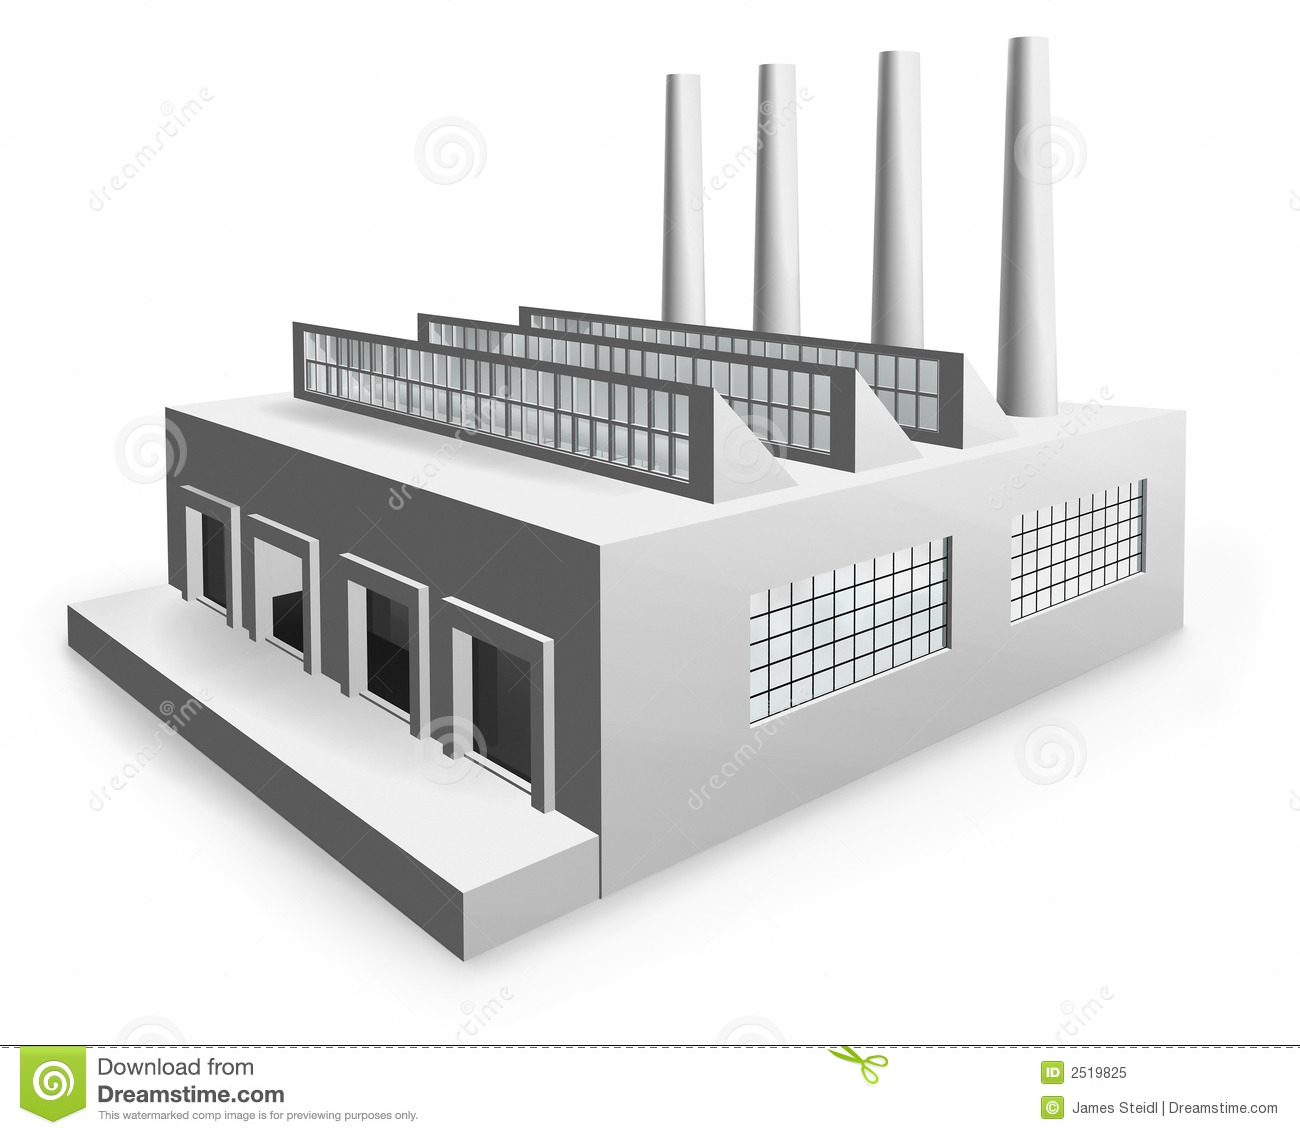 Factory clipart model. Panda free images